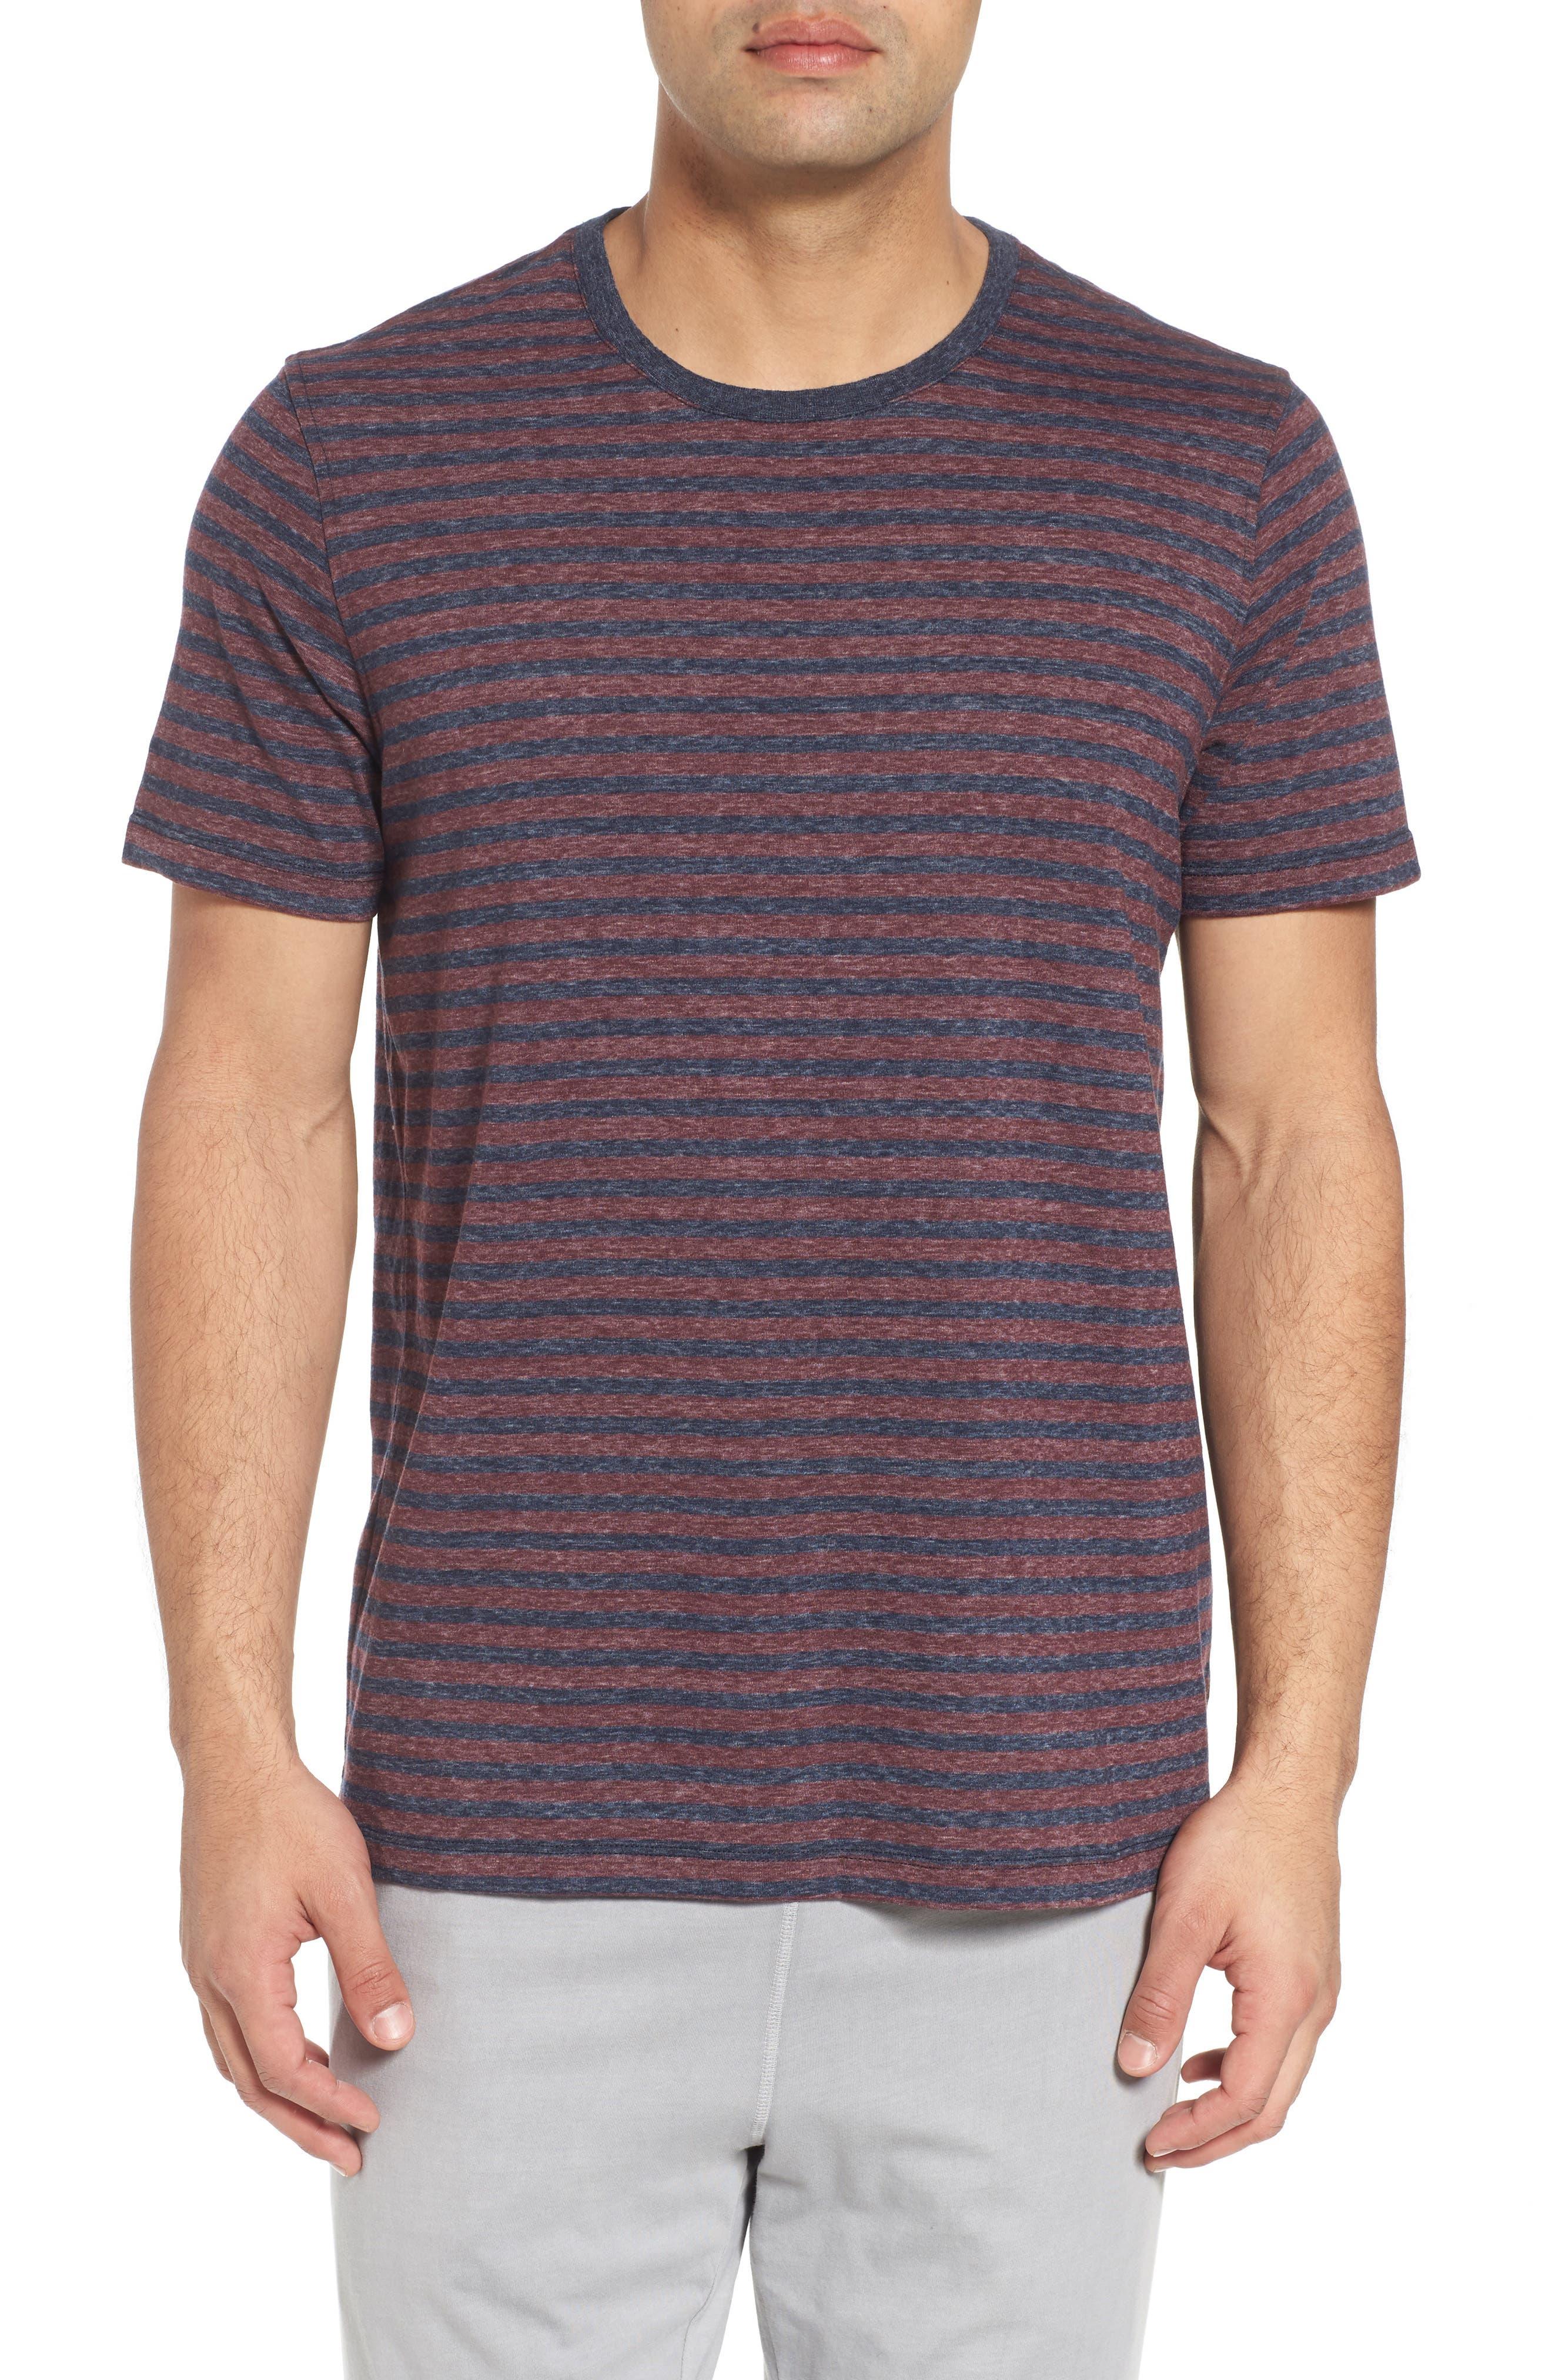 Crewneck Recycled Cotton Blend T-Shirt,                             Main thumbnail 1, color,                             482